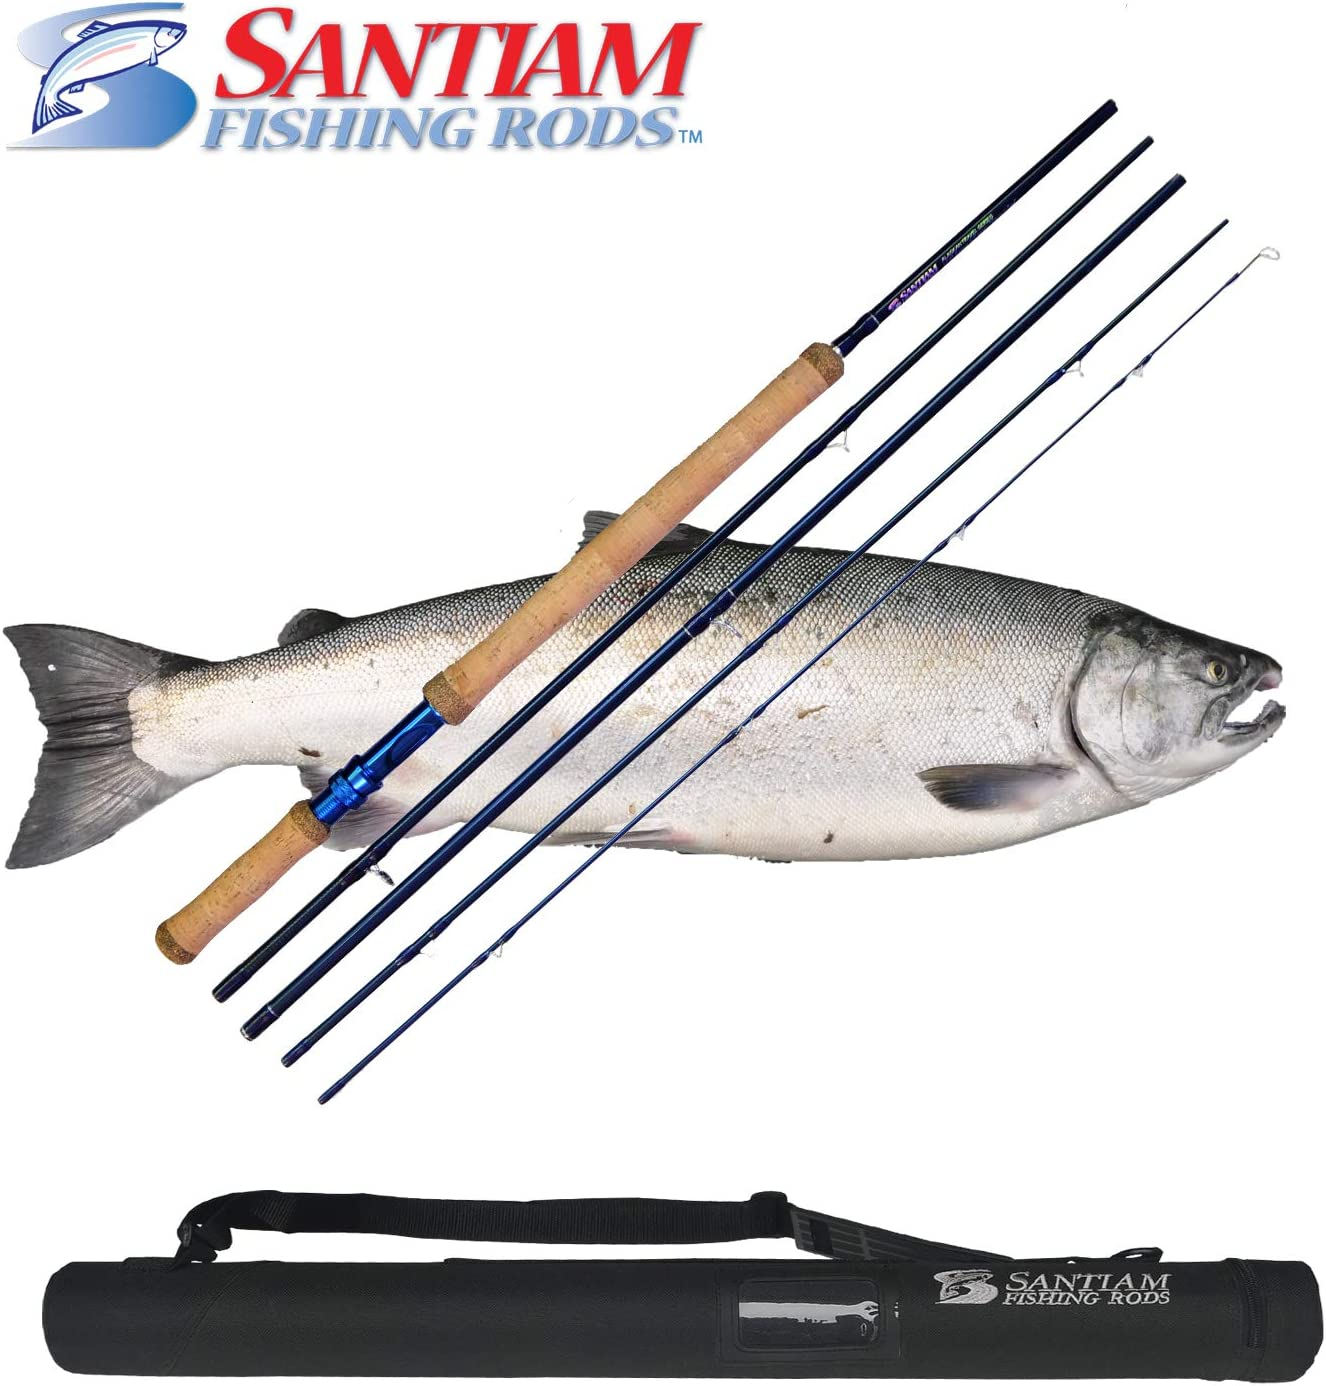 Santiam Fishing Rods 5-piece 11 2 8 9wt Travel Switch Rod w Hard Case